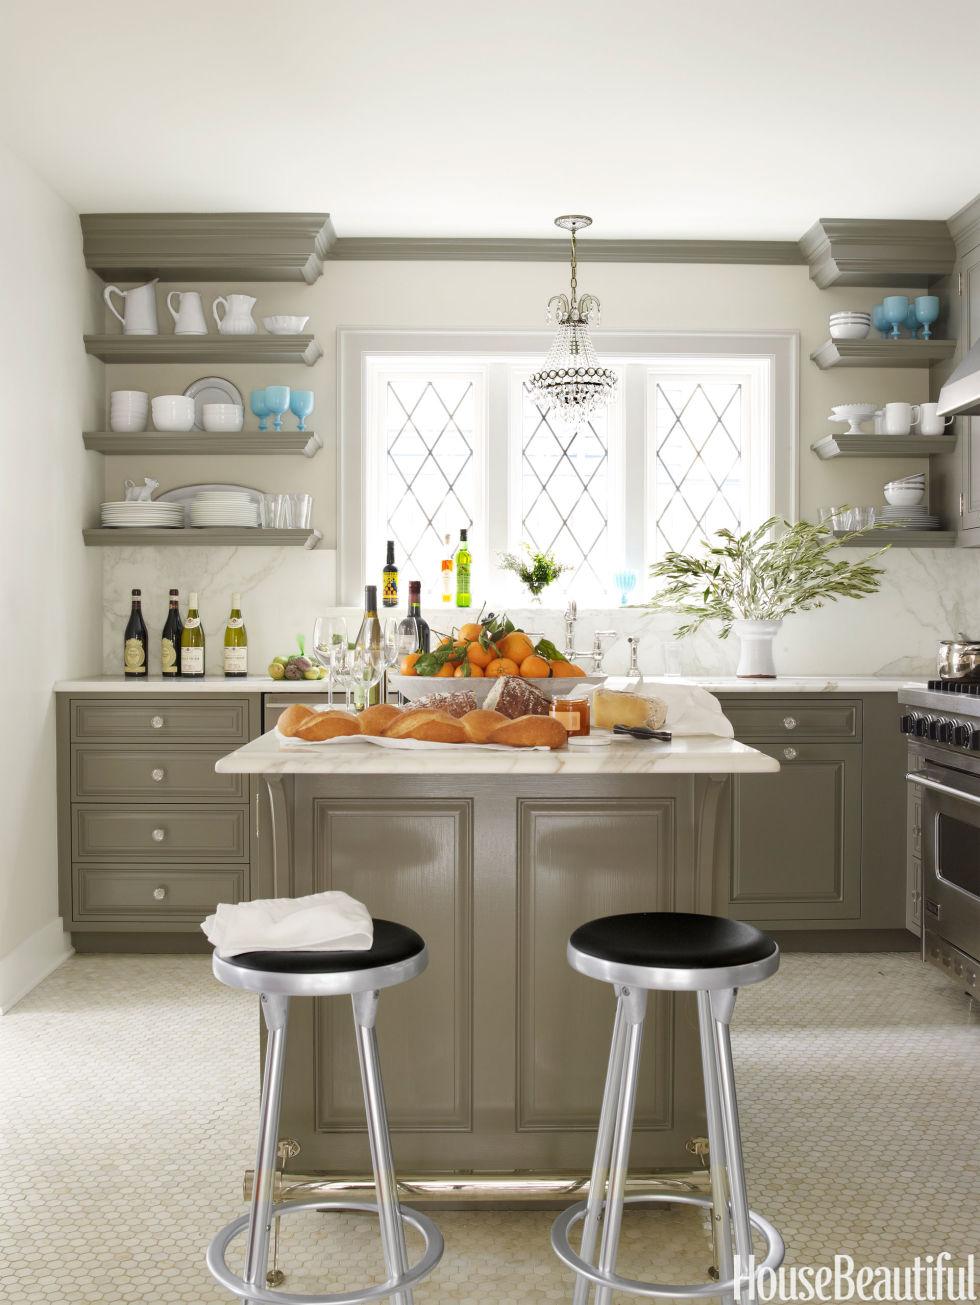 Stylish 20+ Best Kitchen Paint Colors - Ideas for Popular Kitchen Colors paint color ideas for kitchen walls